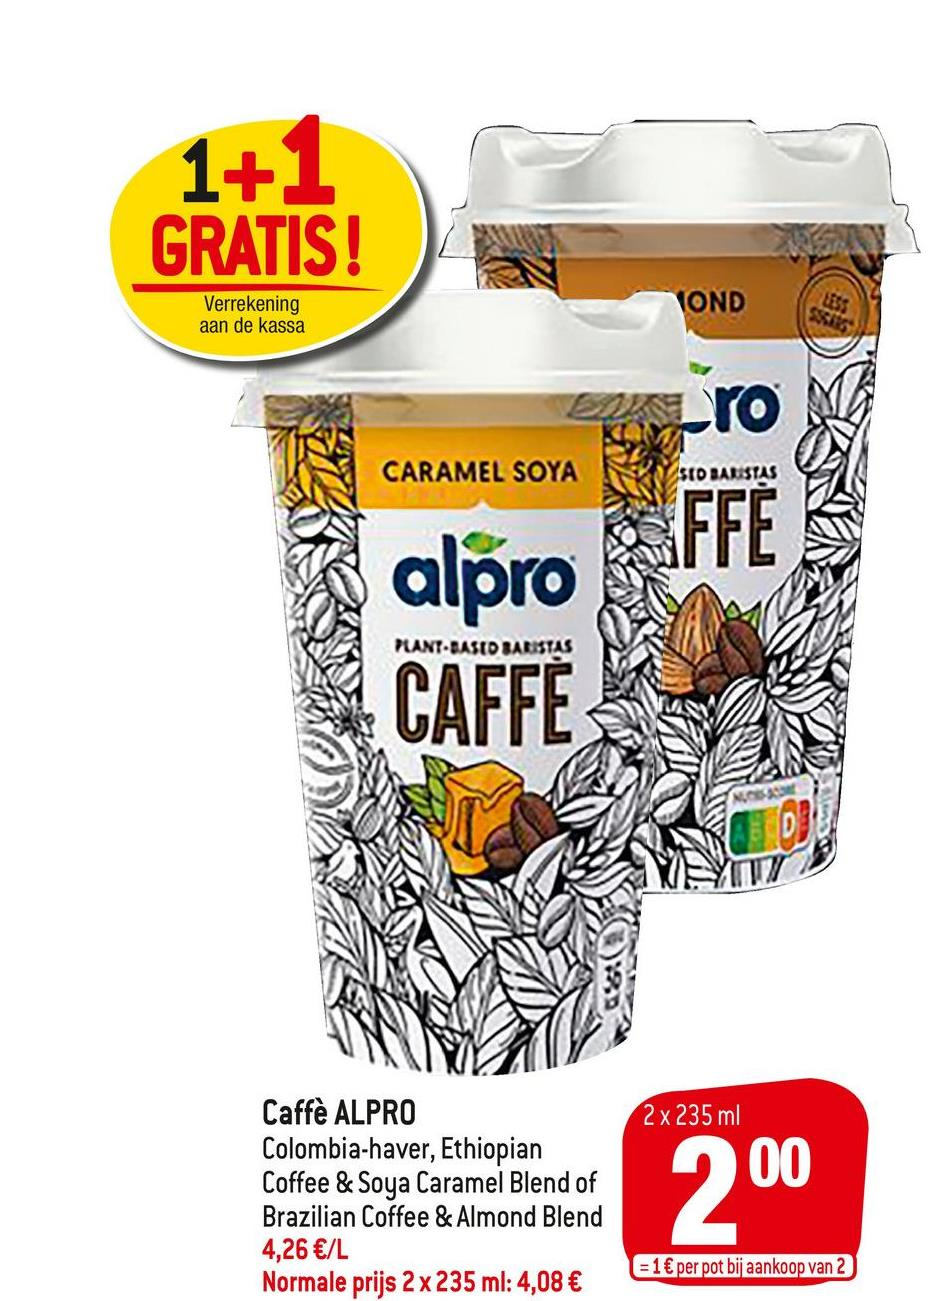 1+1 GRATIS! Verrekening aan de kassa VOND uts SSIES CARAMEL SOYA SED BARISTAS ro FFE PANT-BASED BARISTAS alpro CAFFE 2 x 235 ml Caffè ALPRO Colombia-haver, Ethiopian Coffee & Soya Caramel Blend of Brazilian Coffee & Almond Blend 4,26 €/L Normale prijs 2 x 235 ml: 4,08 € 200 = 1€ per pot bij aankoop van 2